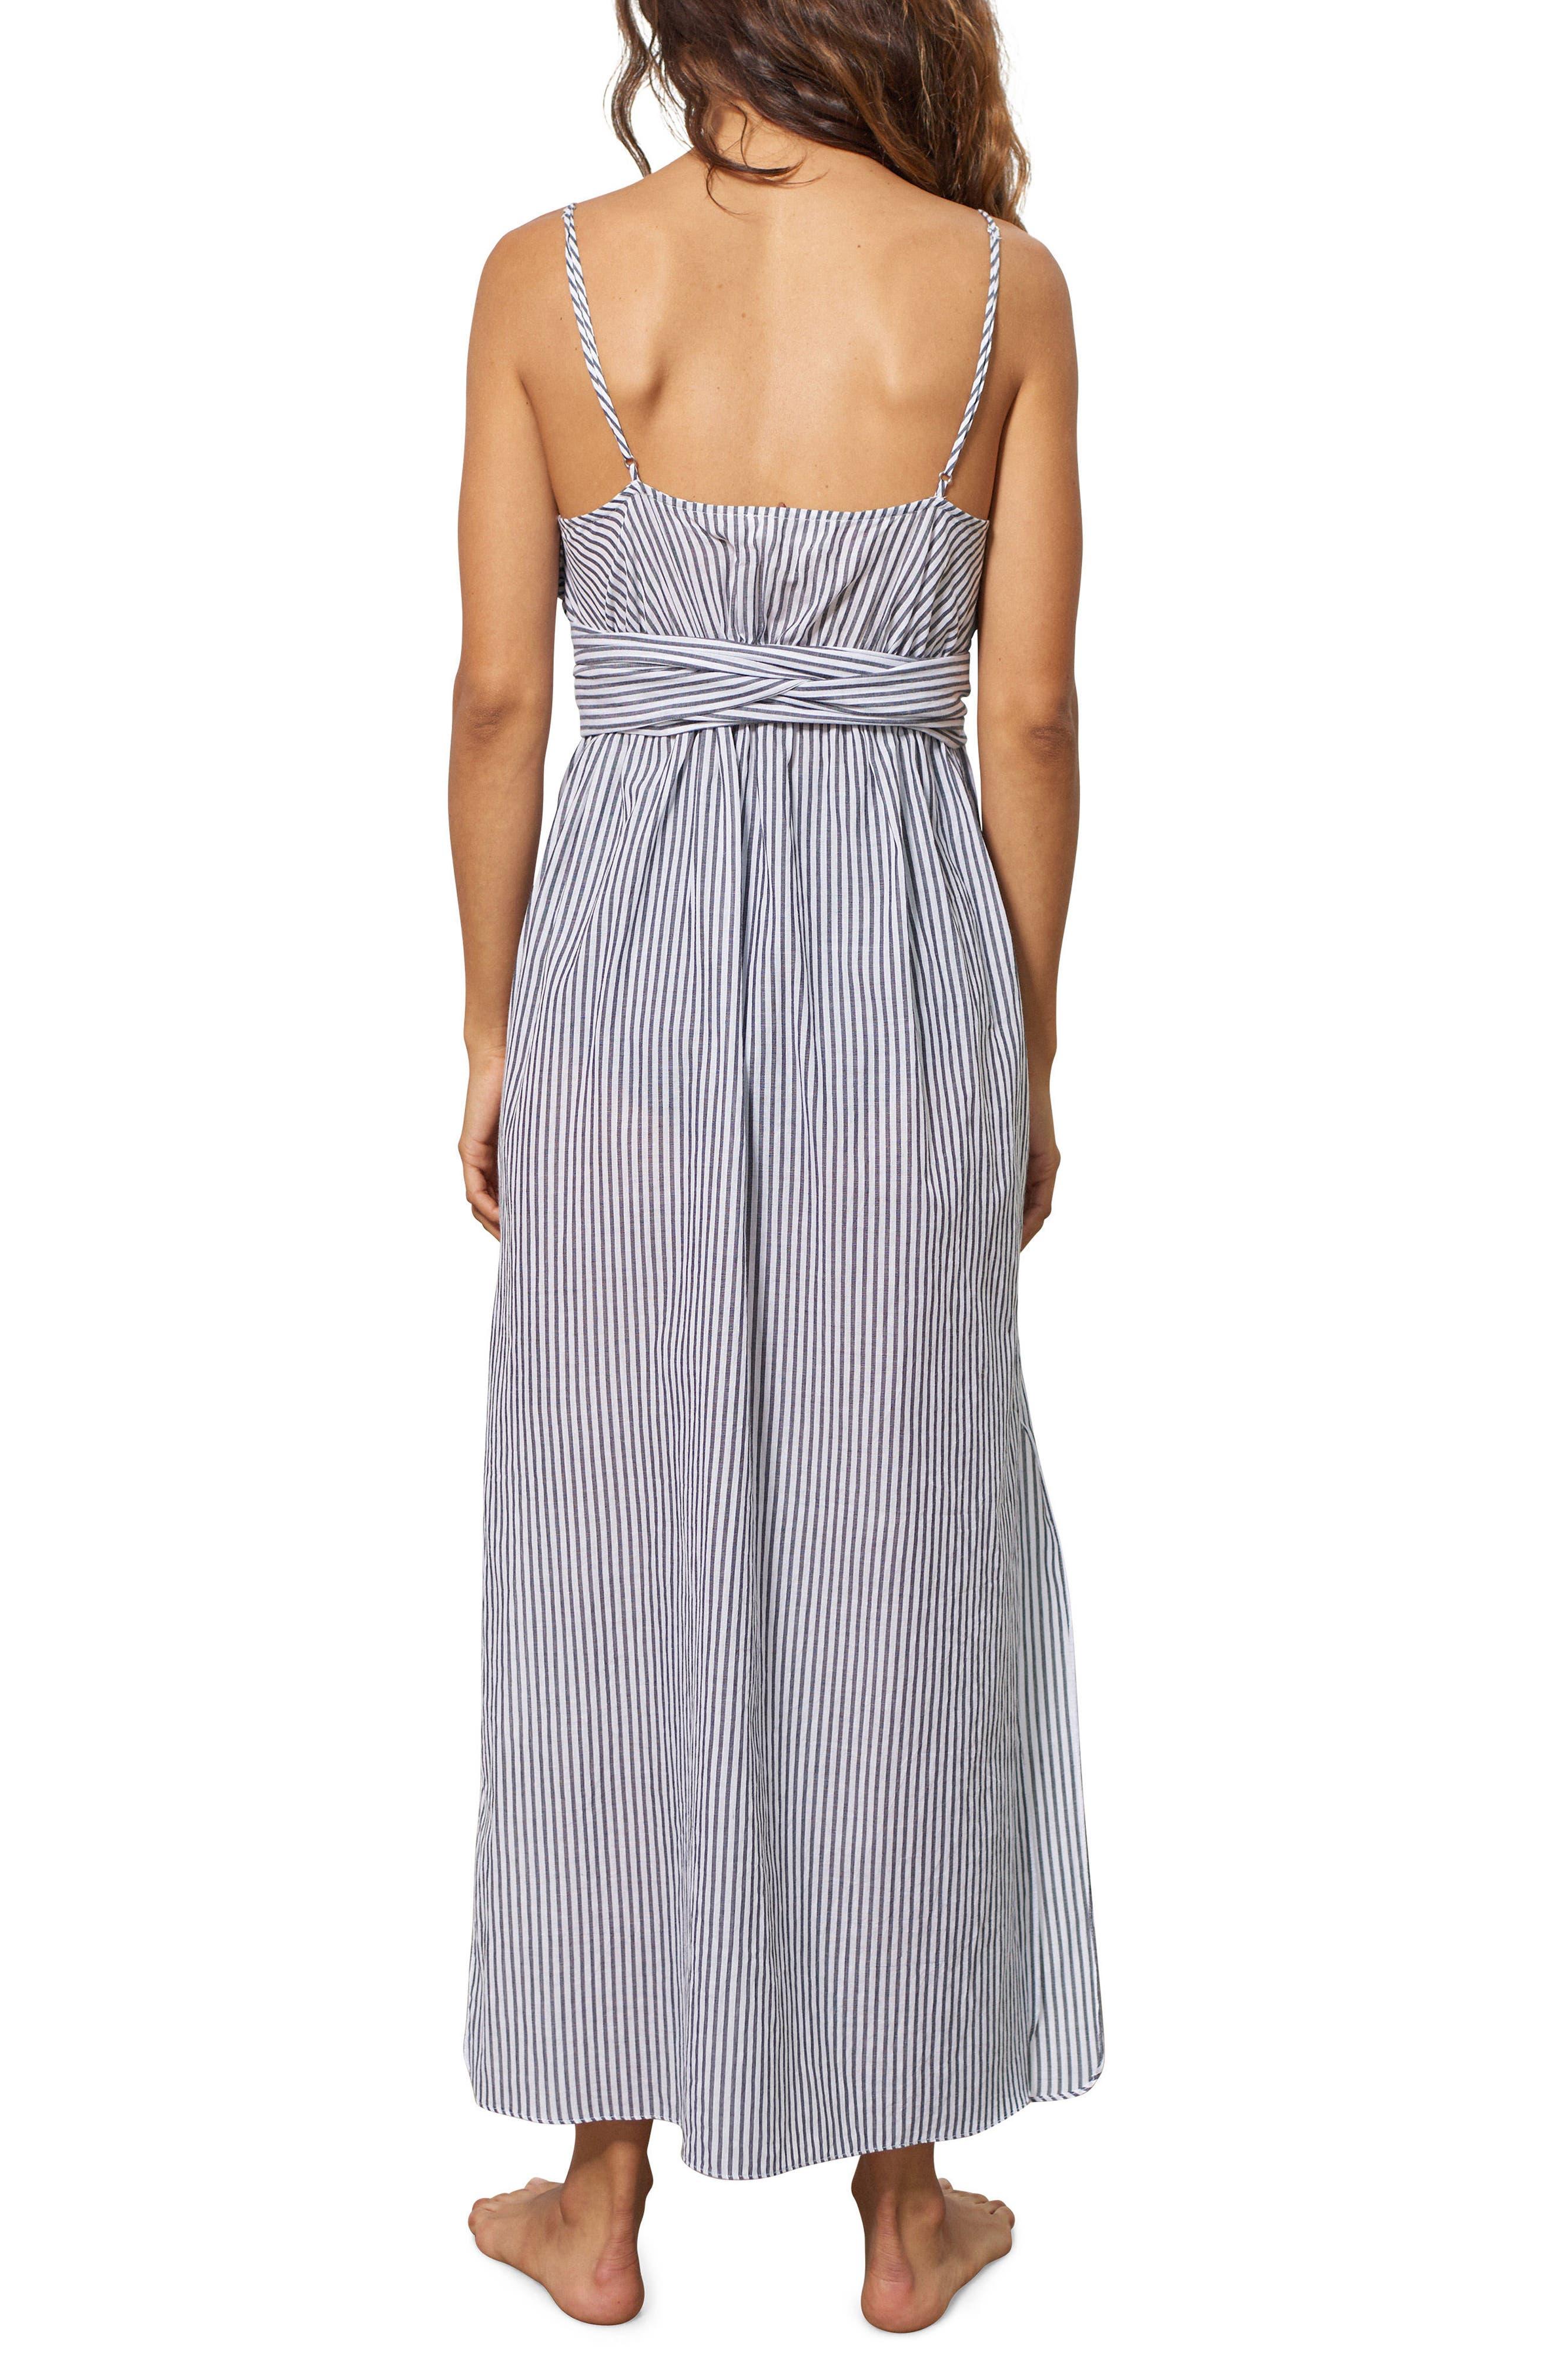 Thora Stripe Cover-Up Dress,                             Alternate thumbnail 2, color,                             Black/ White